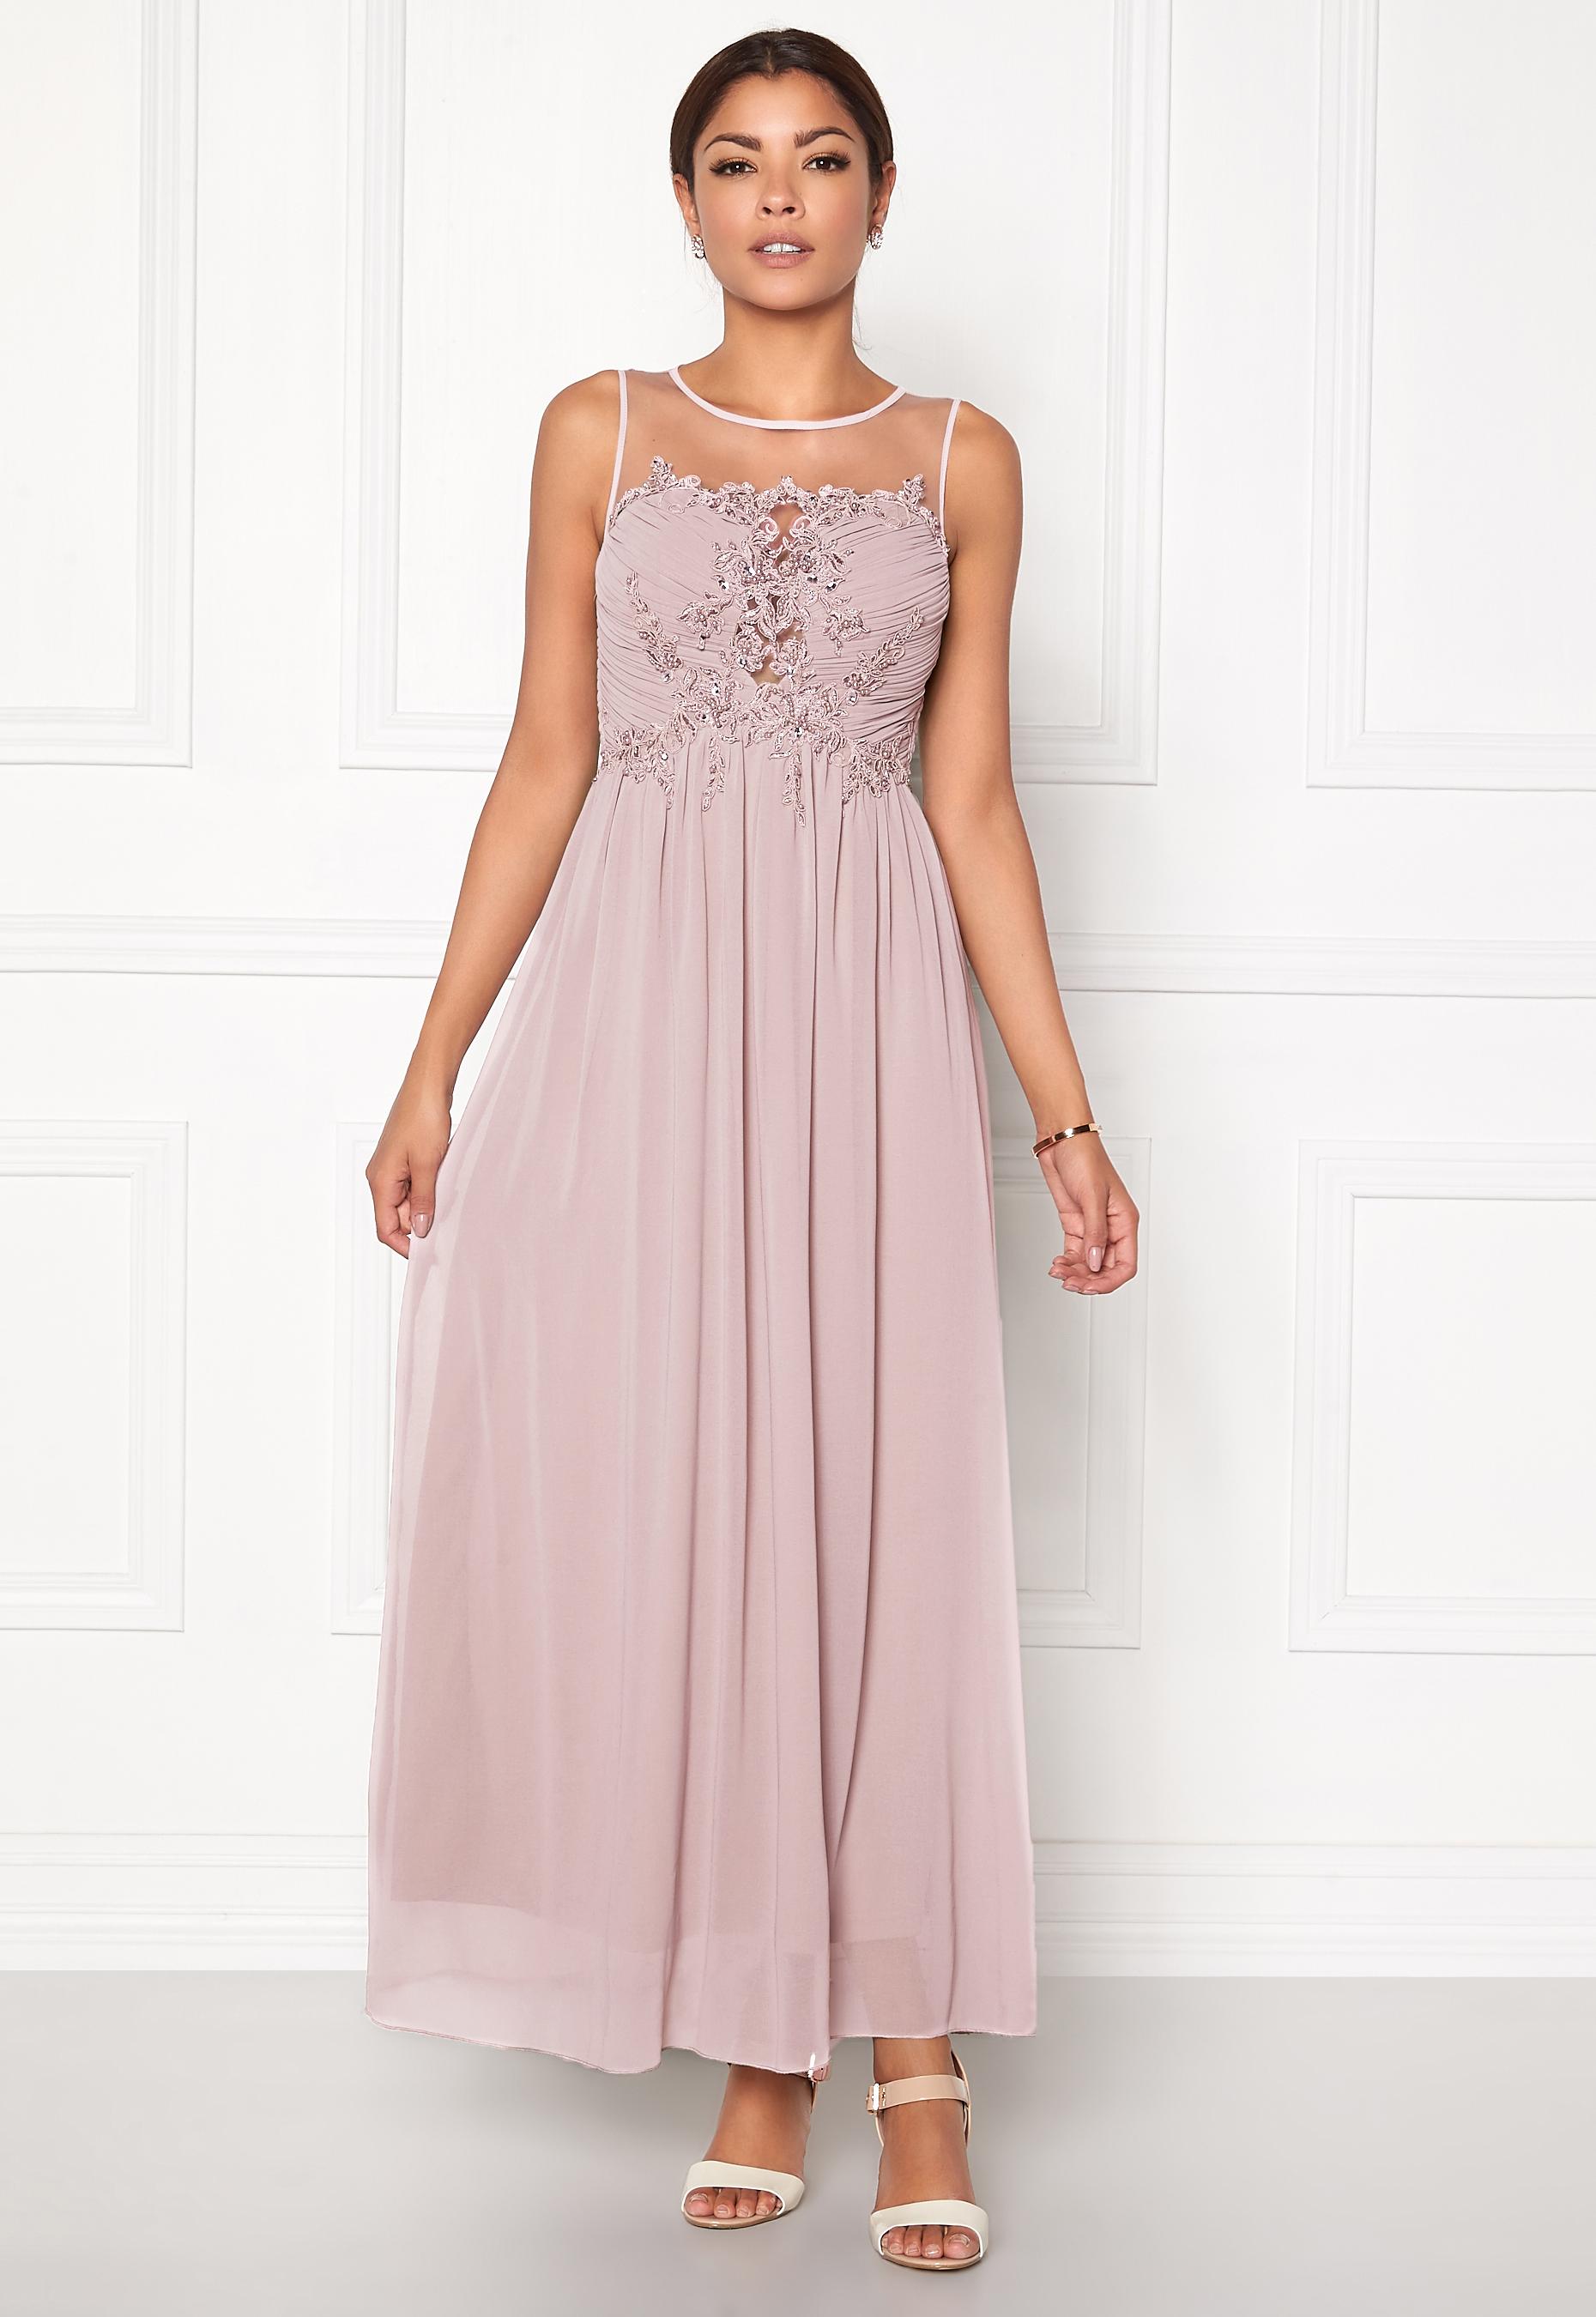 ab9183bfd5f4 Chiara Forthi Ariana Embellished Dress Dusty pink - Bubbleroom